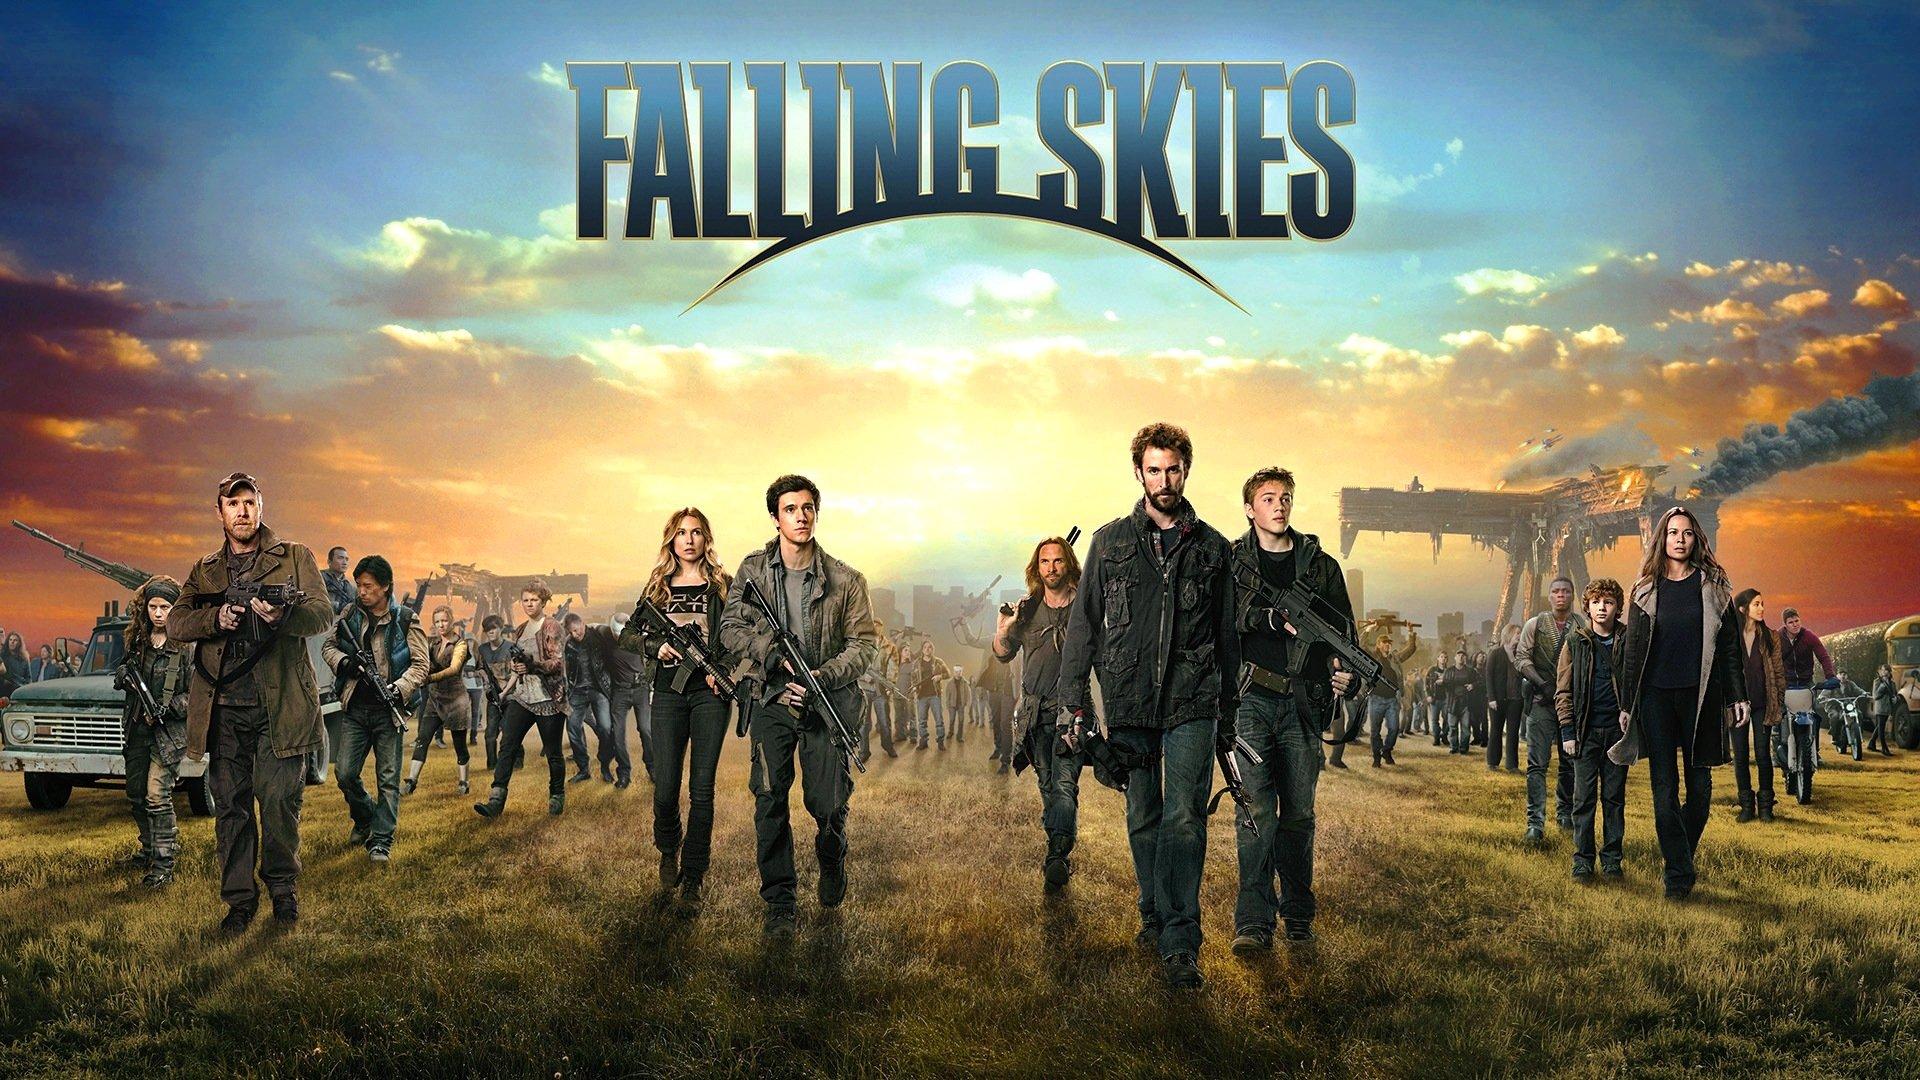 Falling Skies Season 1 Cast